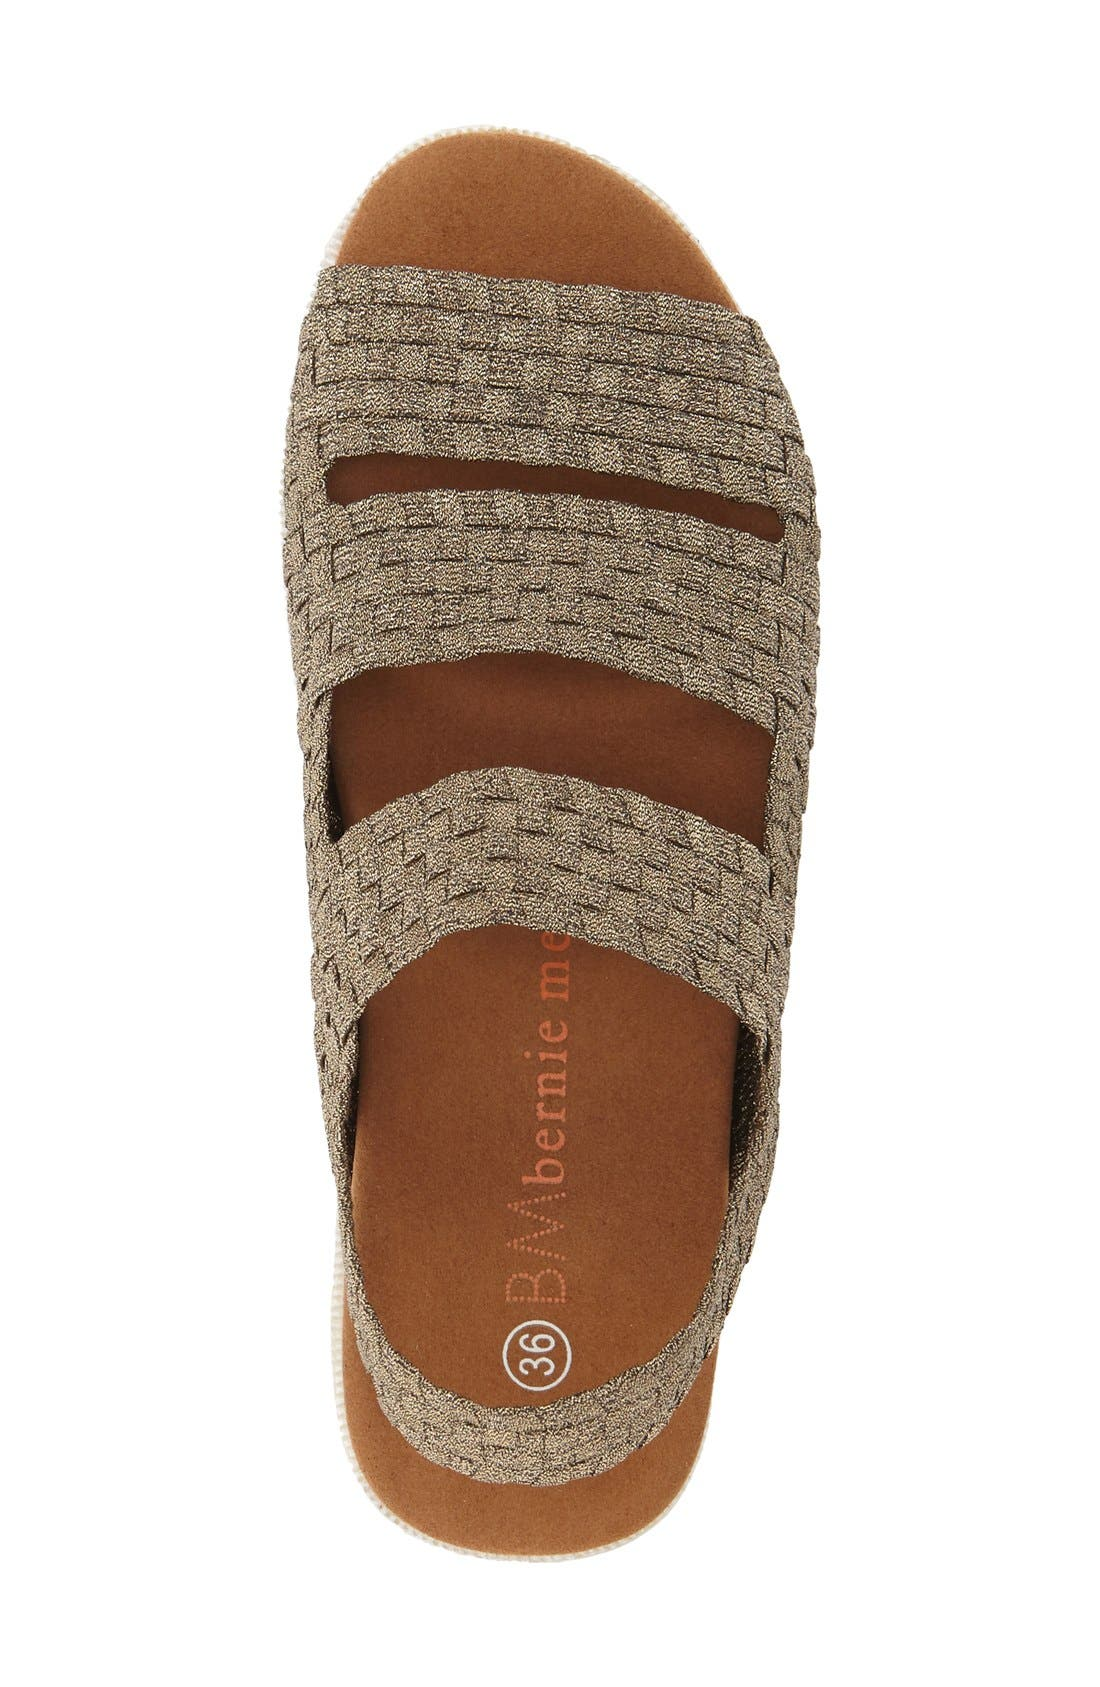 'Crisp' Woven Platform Sandal,                             Alternate thumbnail 3, color,                             BRONZE FABRIC